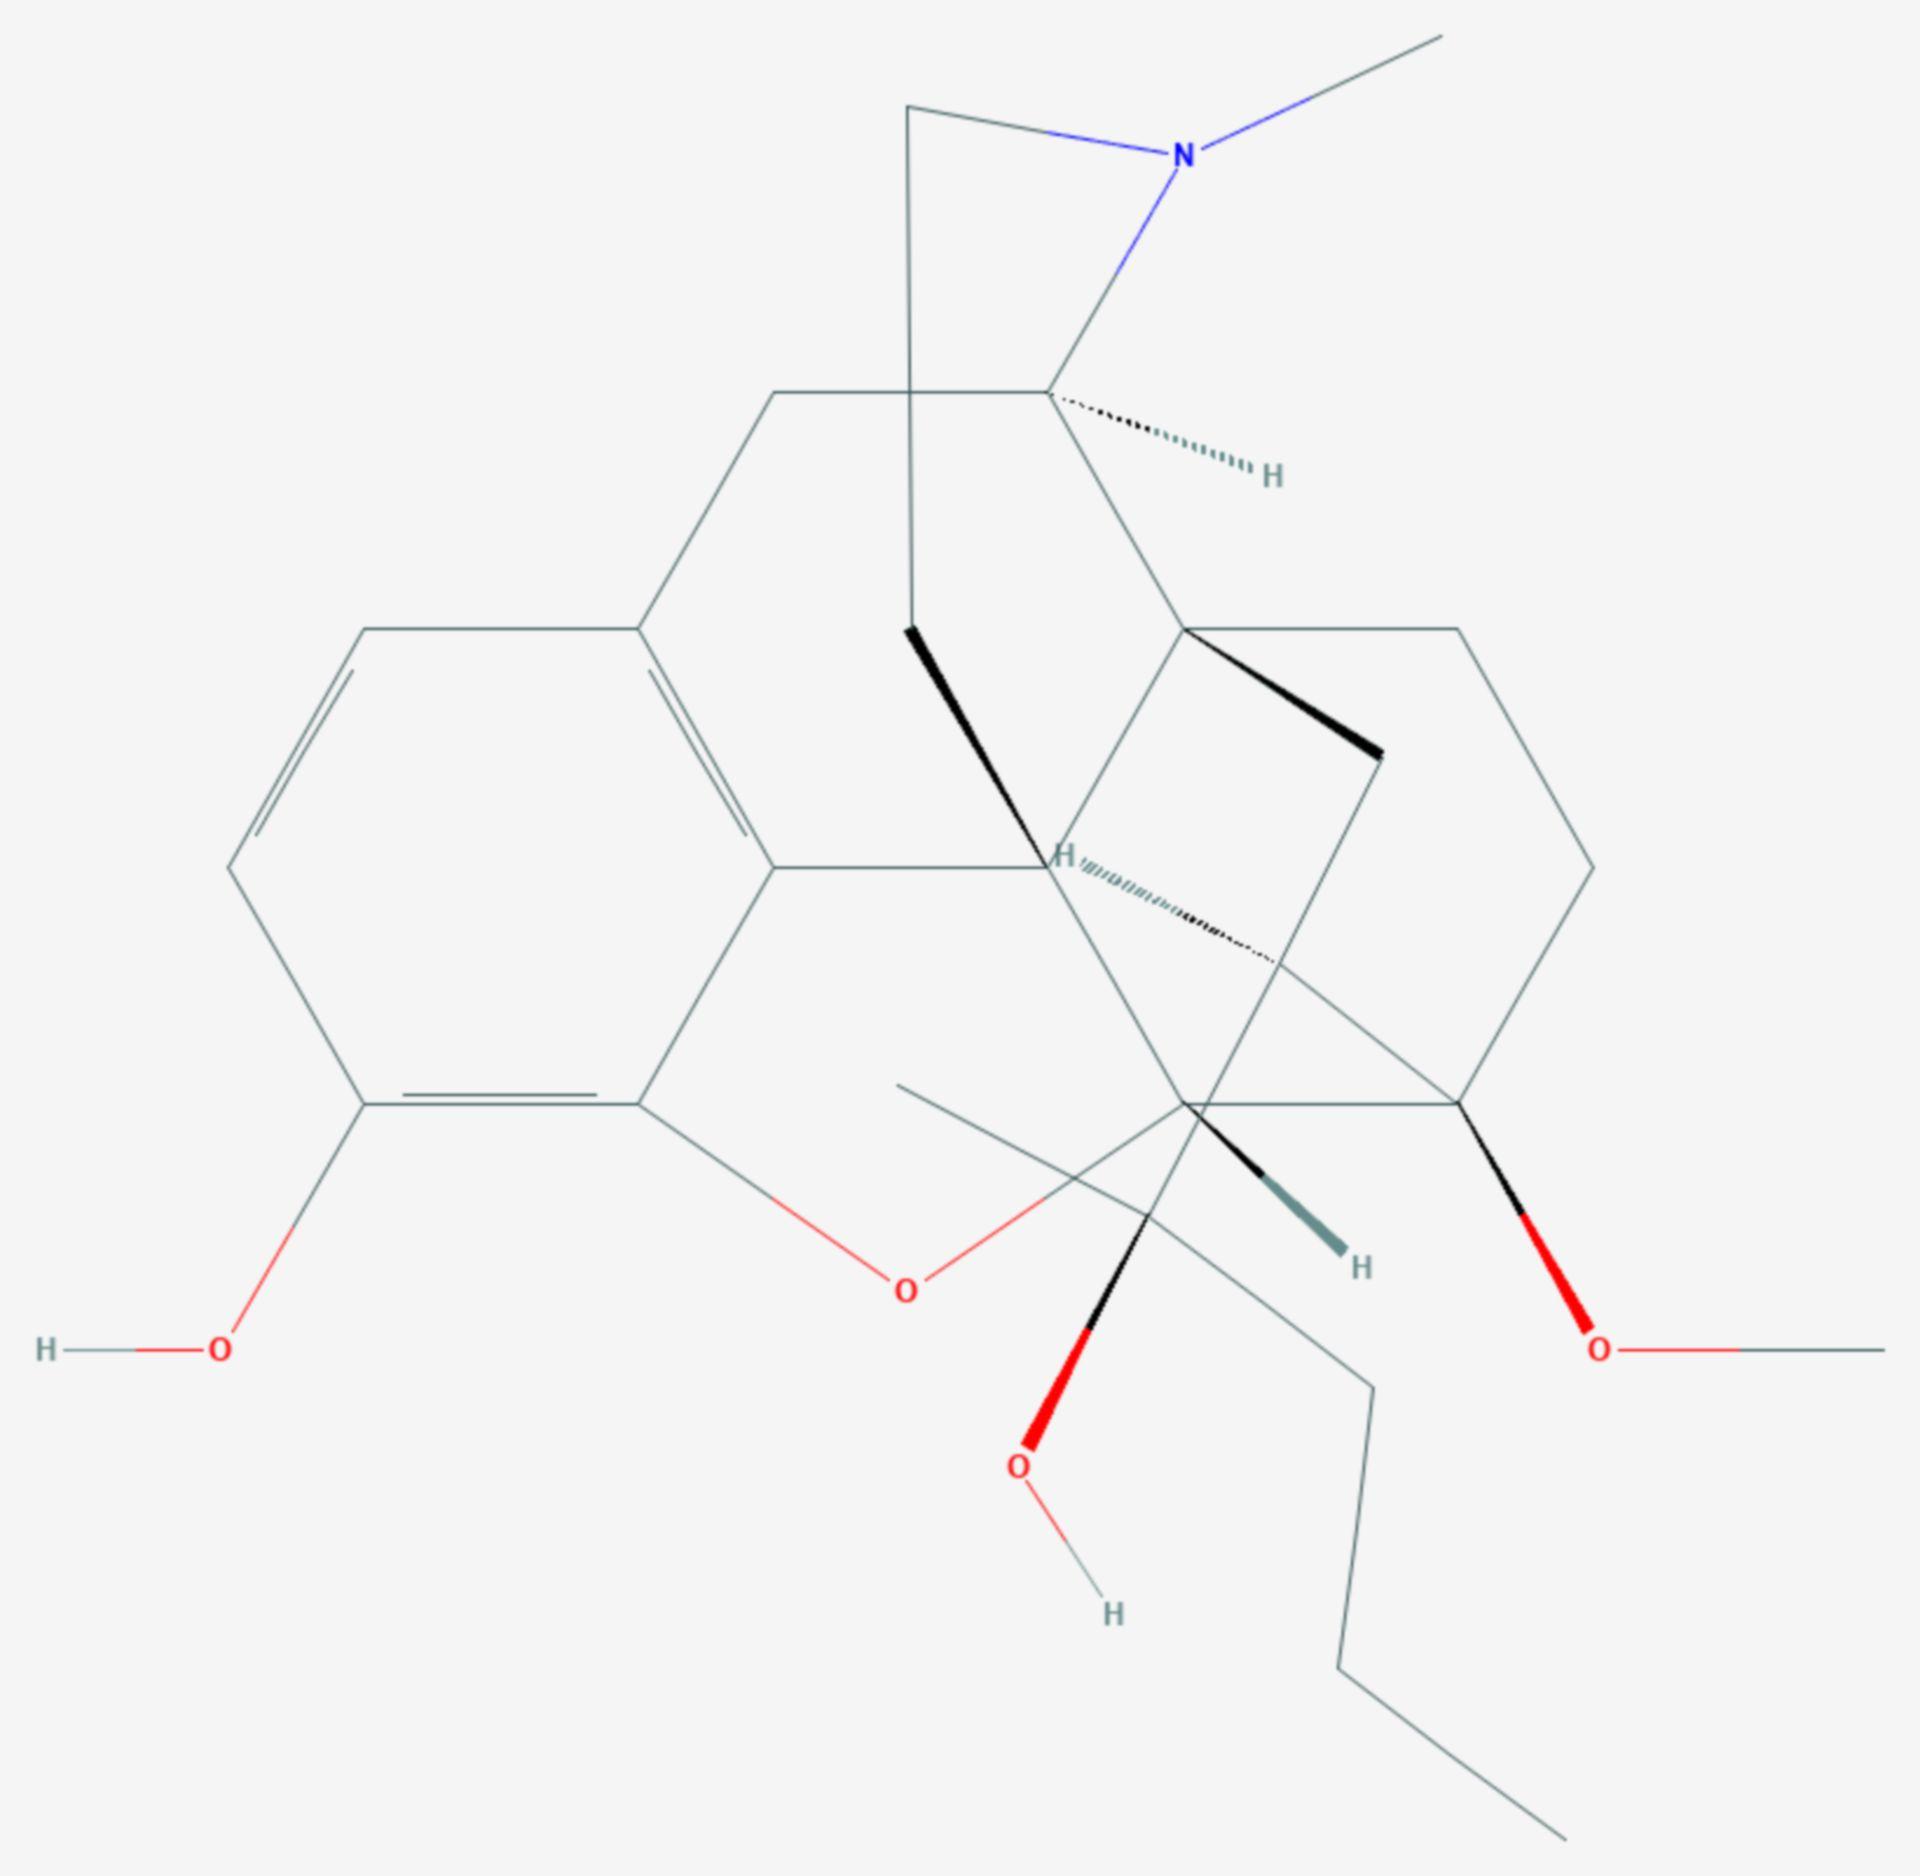 Dihydroetorphin (Strukturformel)